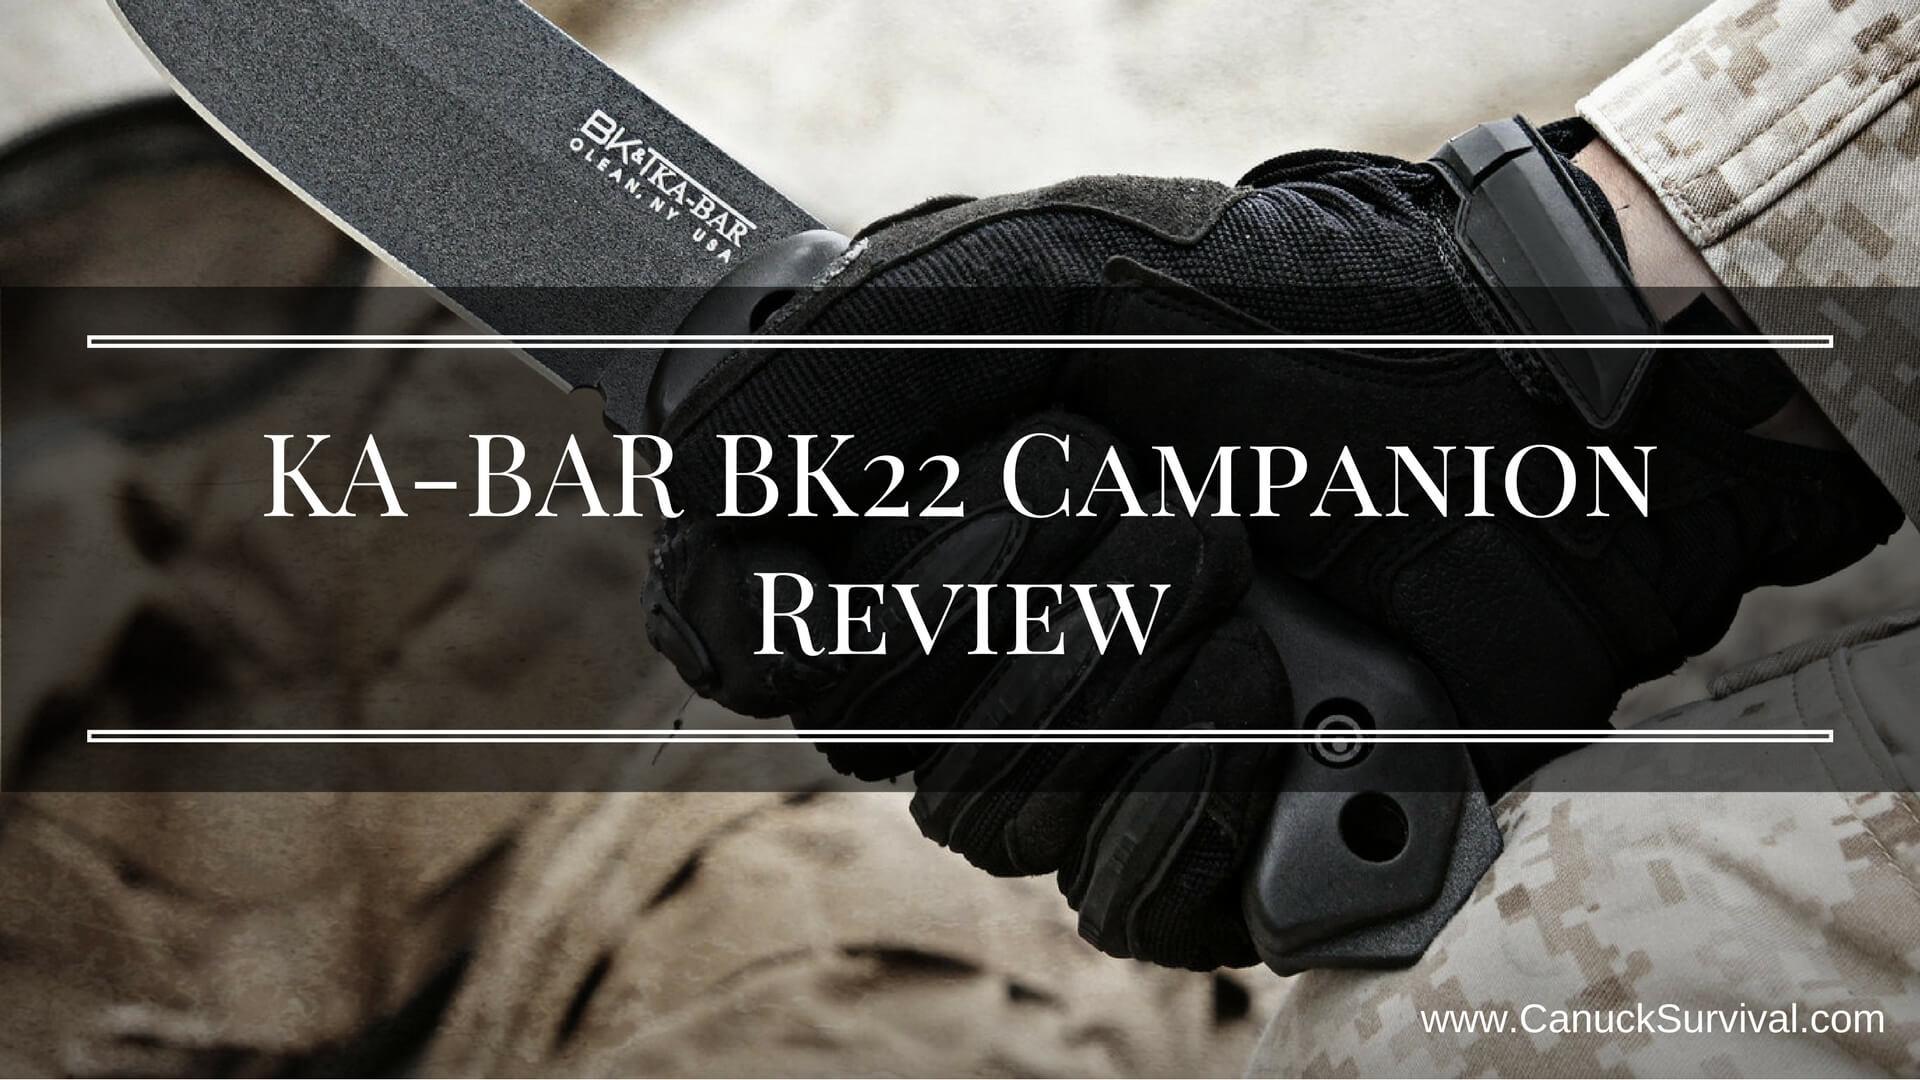 KA-BAR BK22 Campanion Review